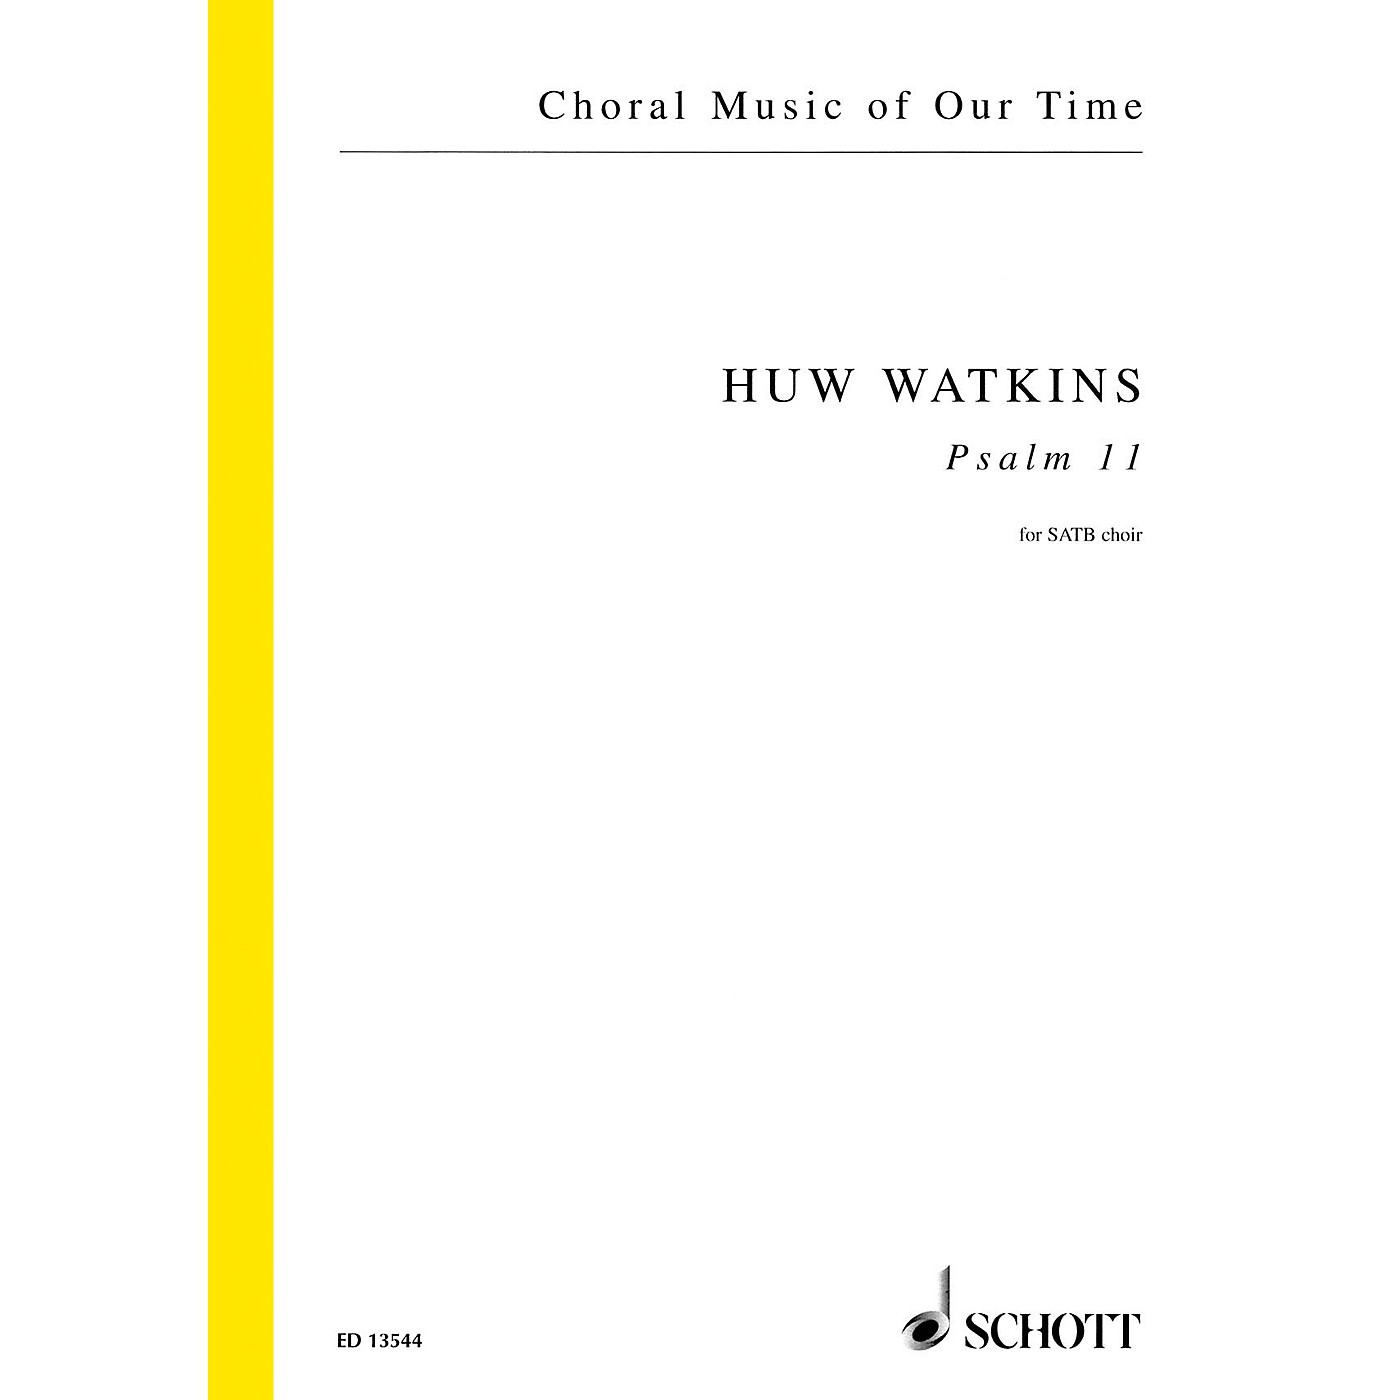 Schott Psalm 11 (SATB Choir unaccompanied) SATB Composed by Huw Watkins thumbnail